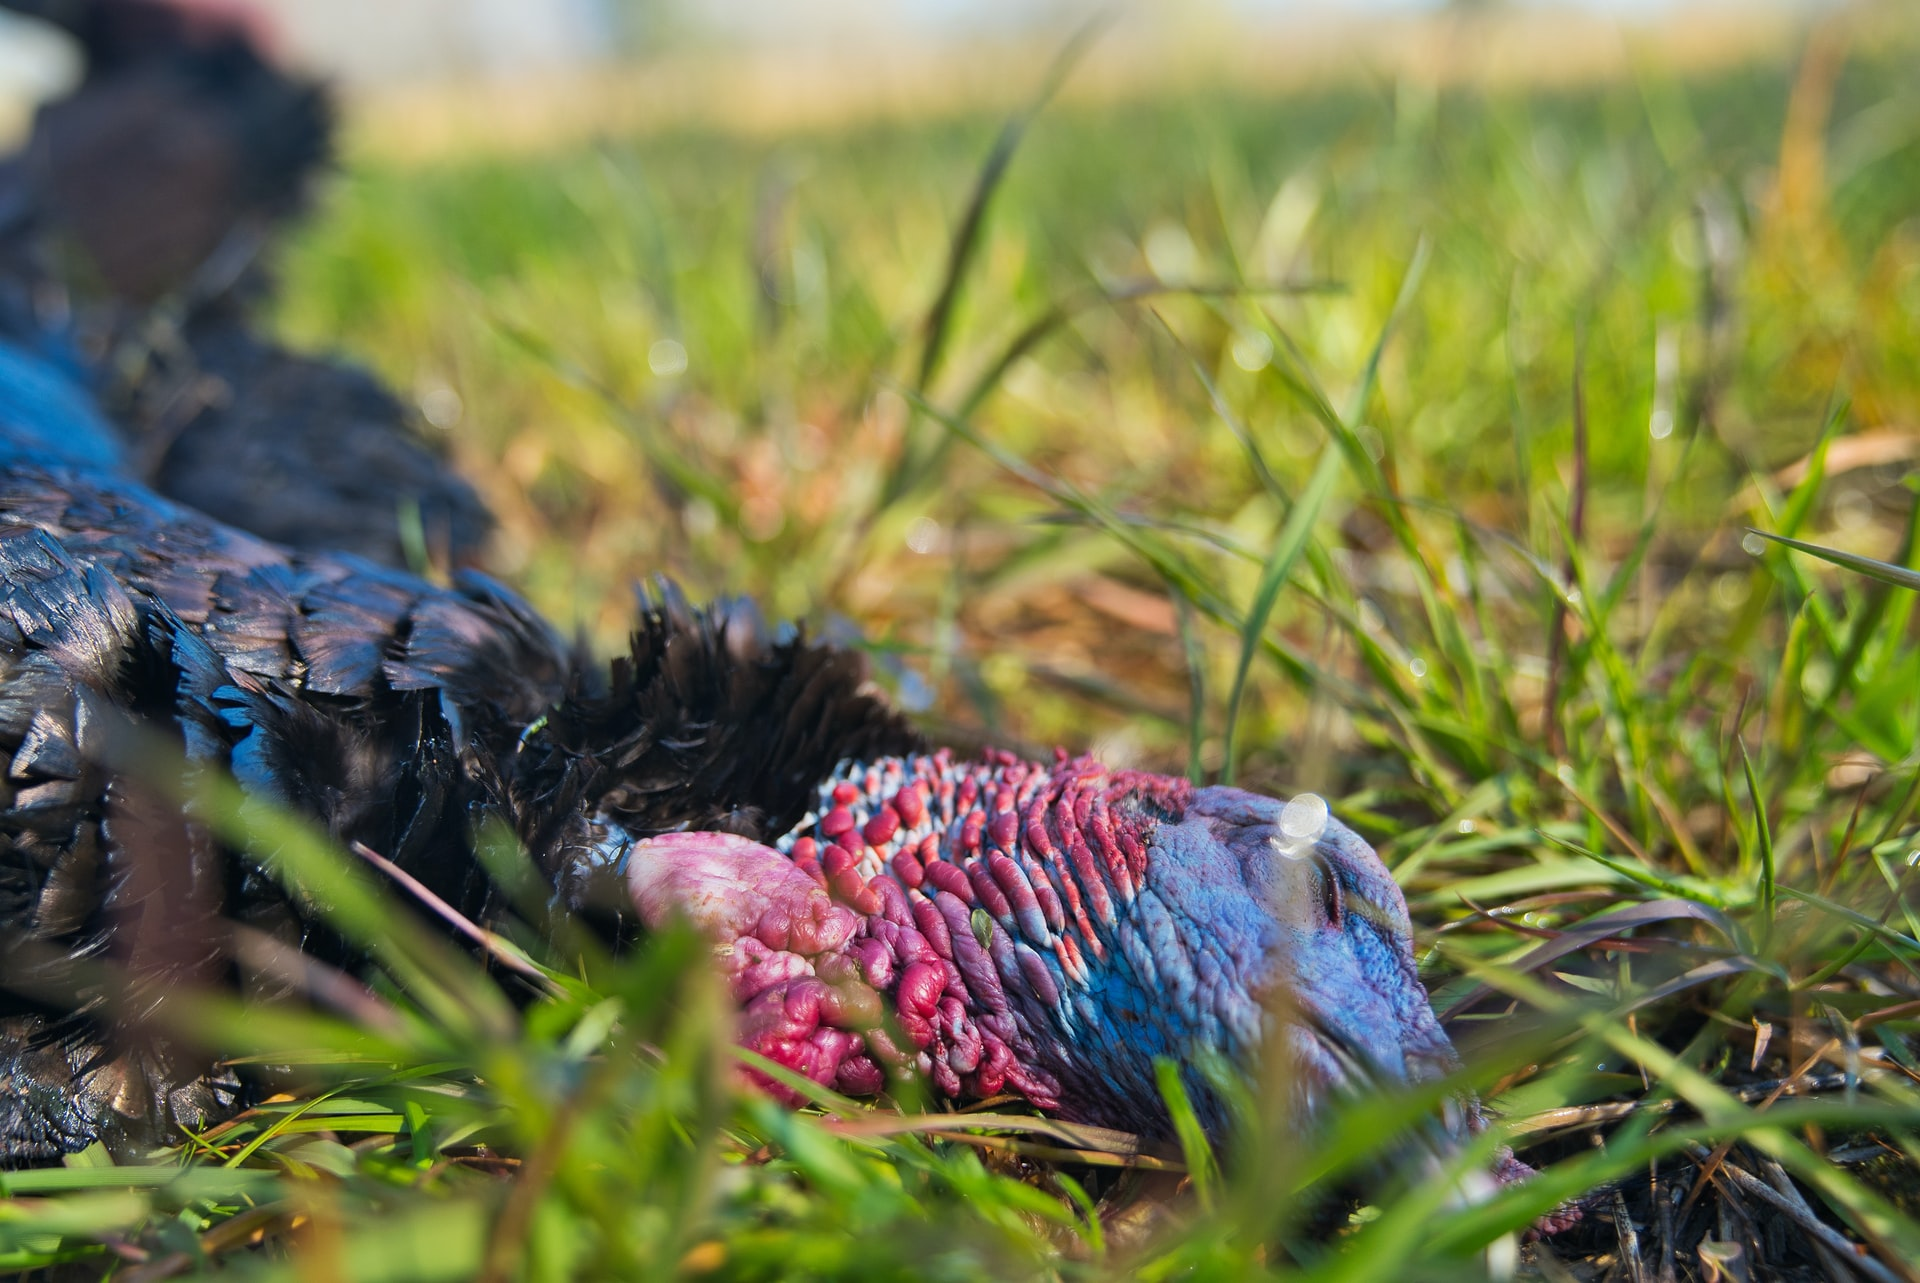 How to start scouting for turkey season